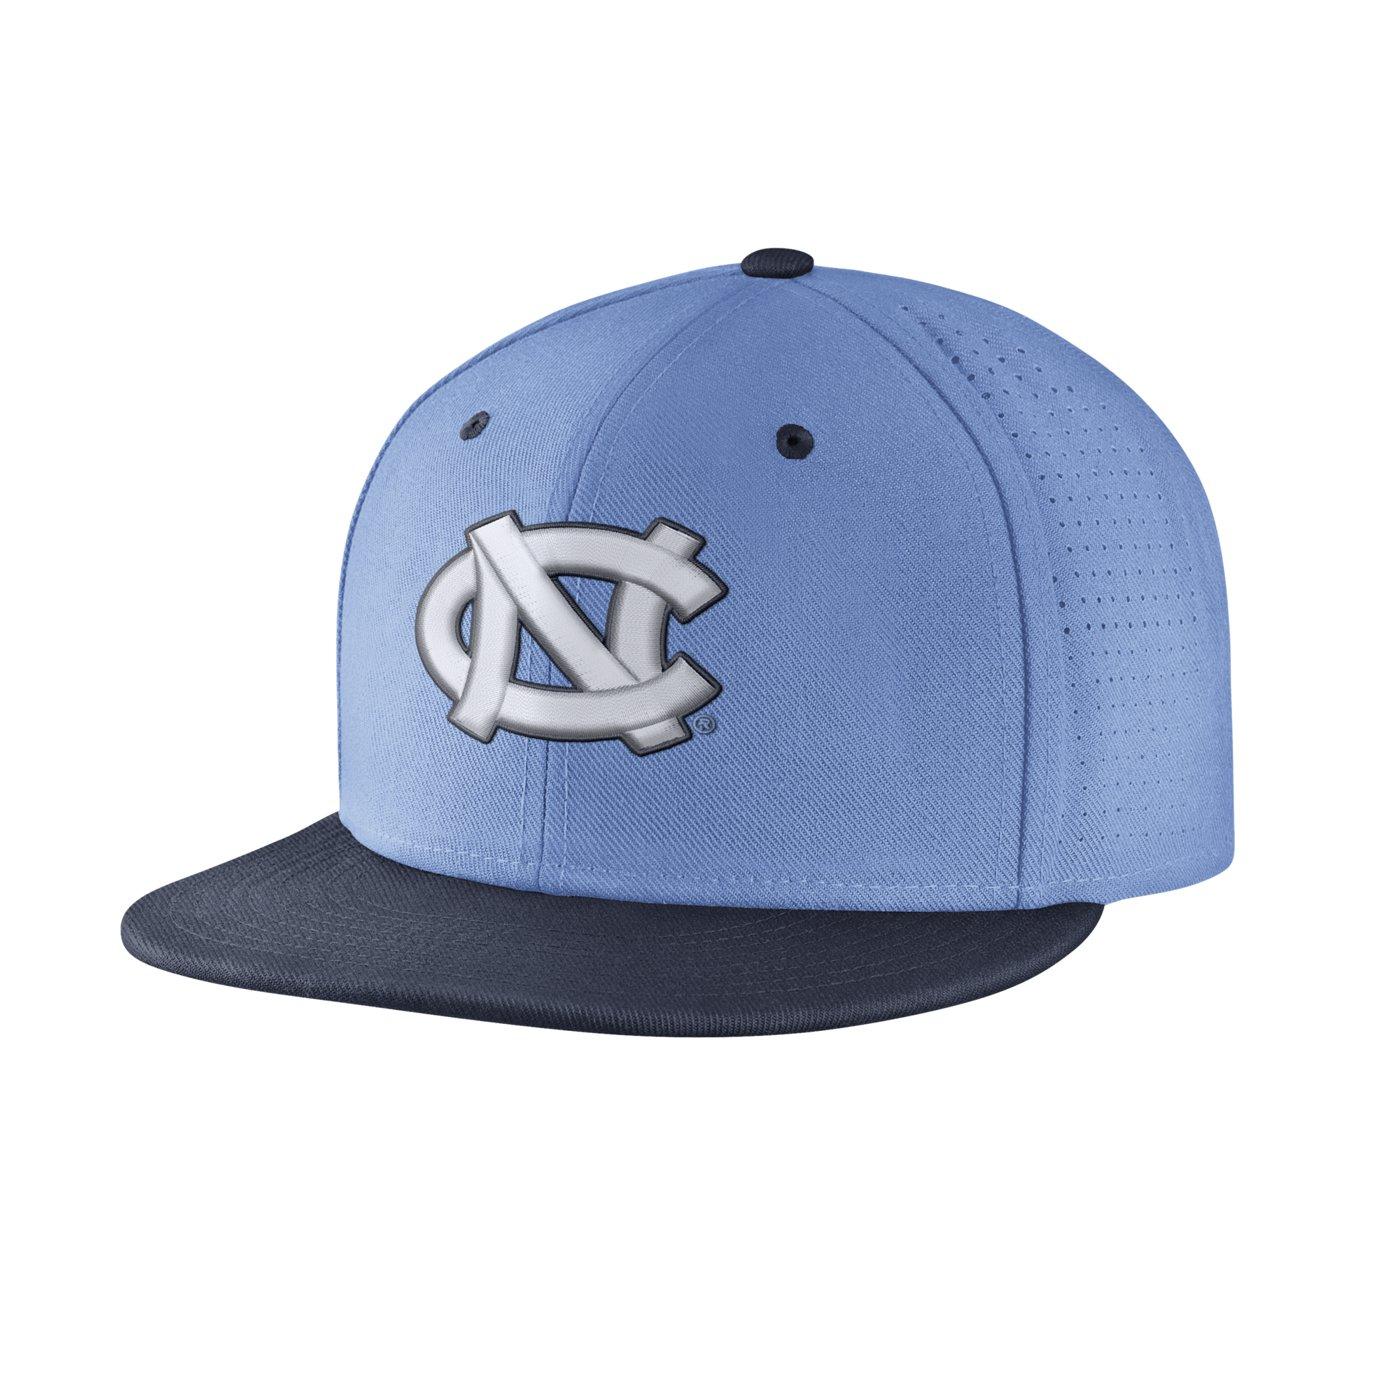 1e0dbe6fb83a2 Johnny T-shirt - North Carolina Tar Heels - Baseball - Nike True Vapor  Fitted Hat (CB) by Nike